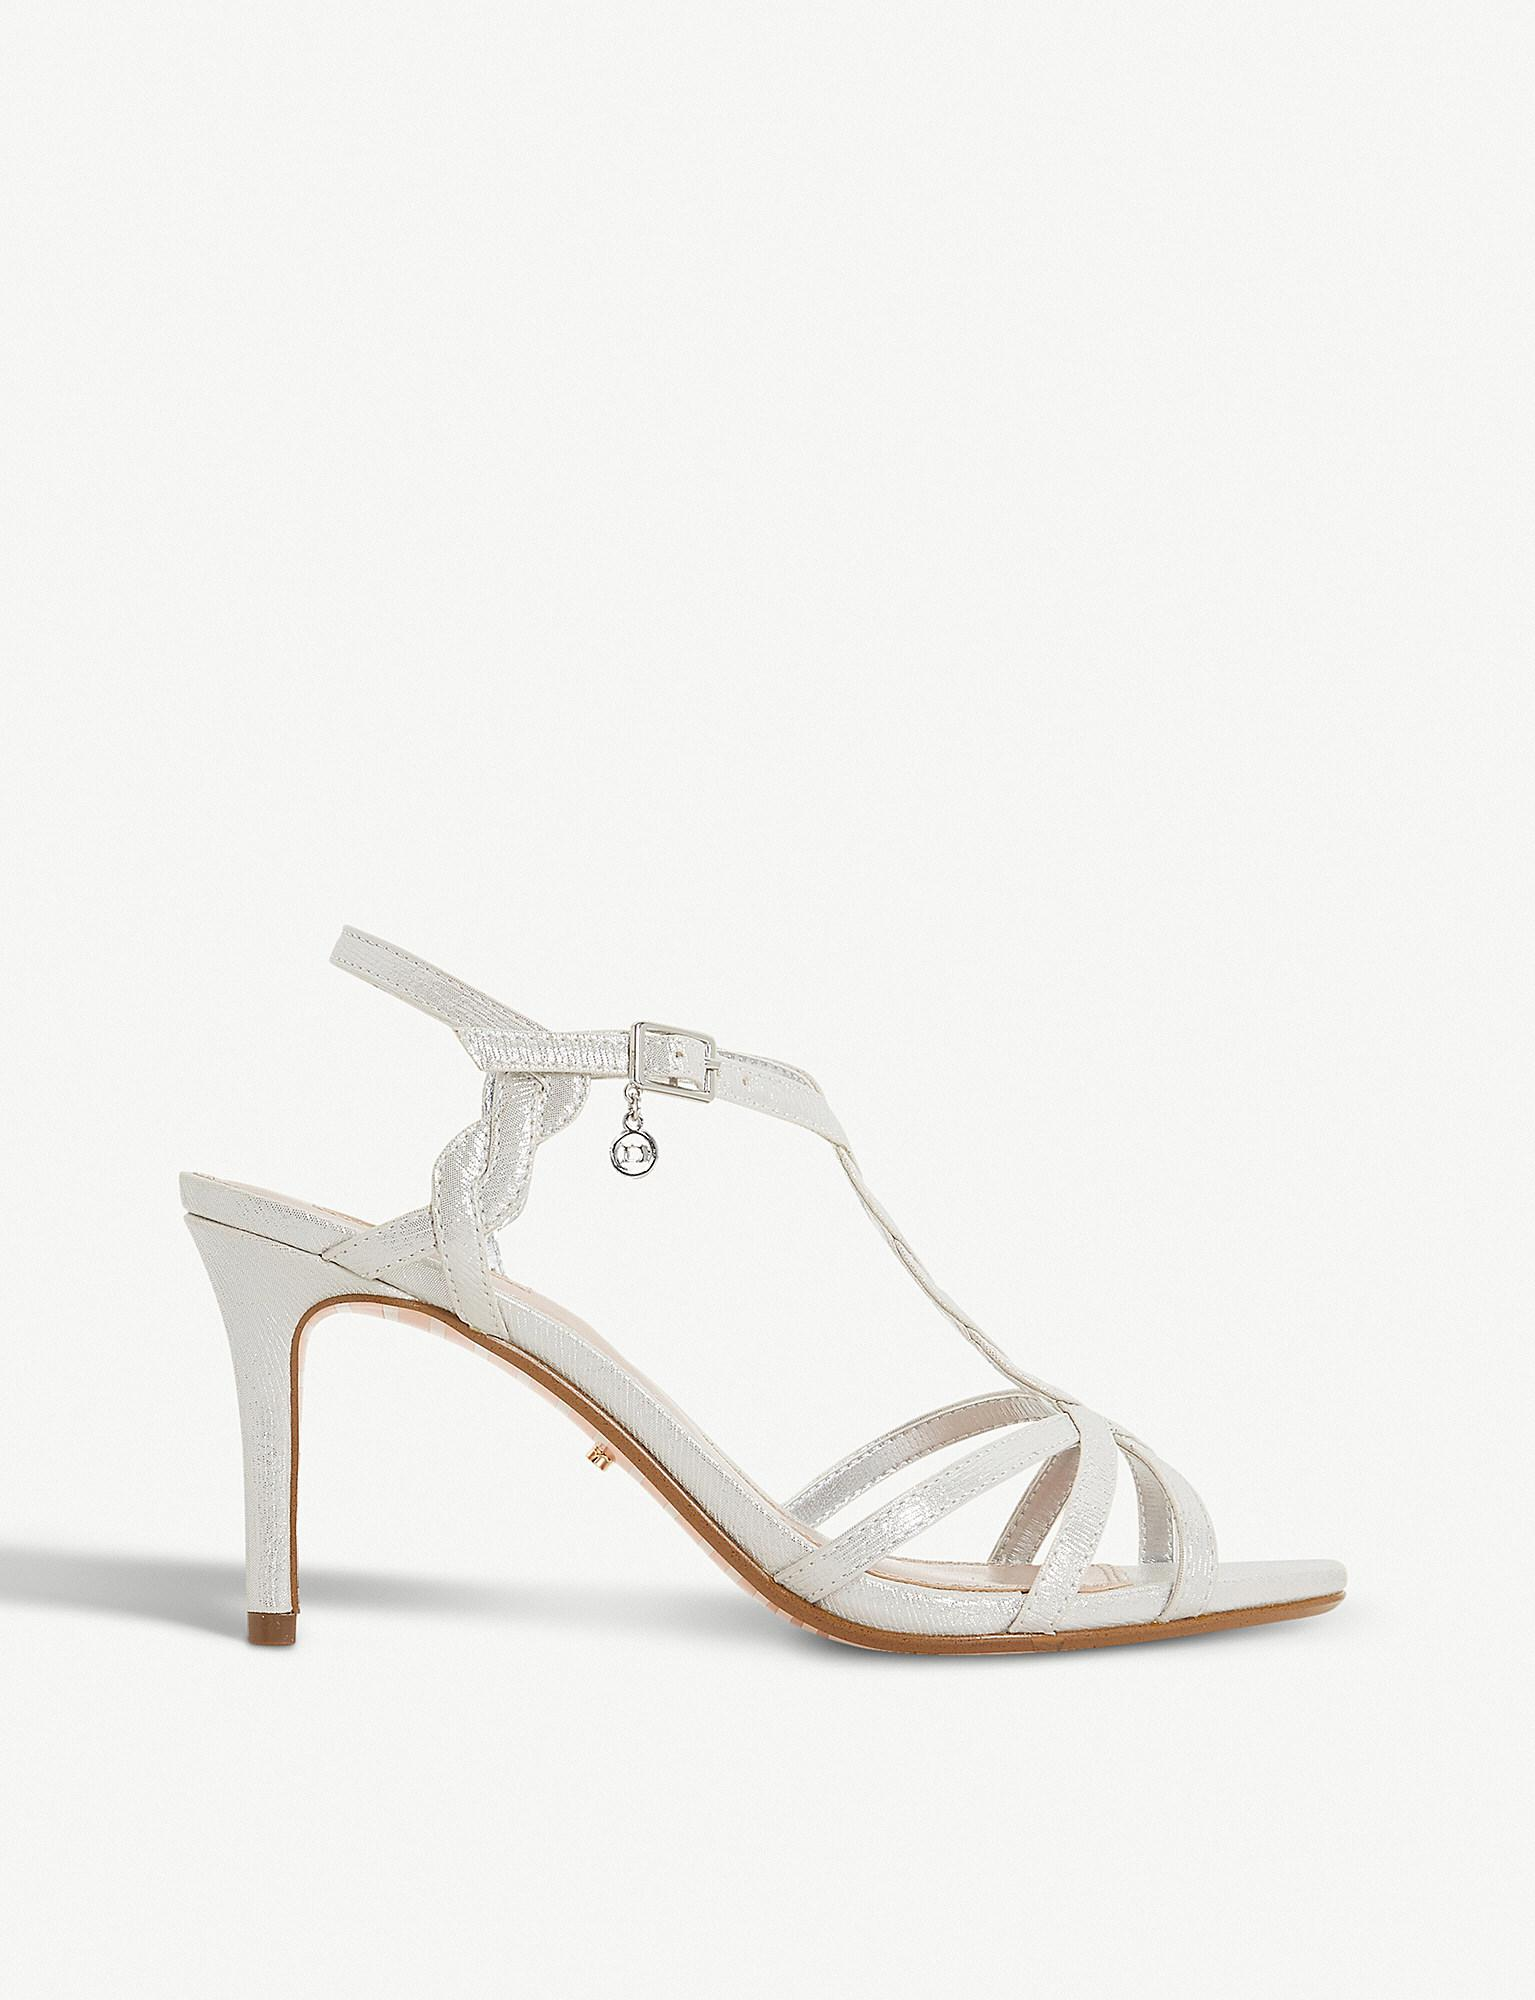 4b0b03a5607 Dune Mystick Patent Mid-heel Sandals in Metallic - Lyst